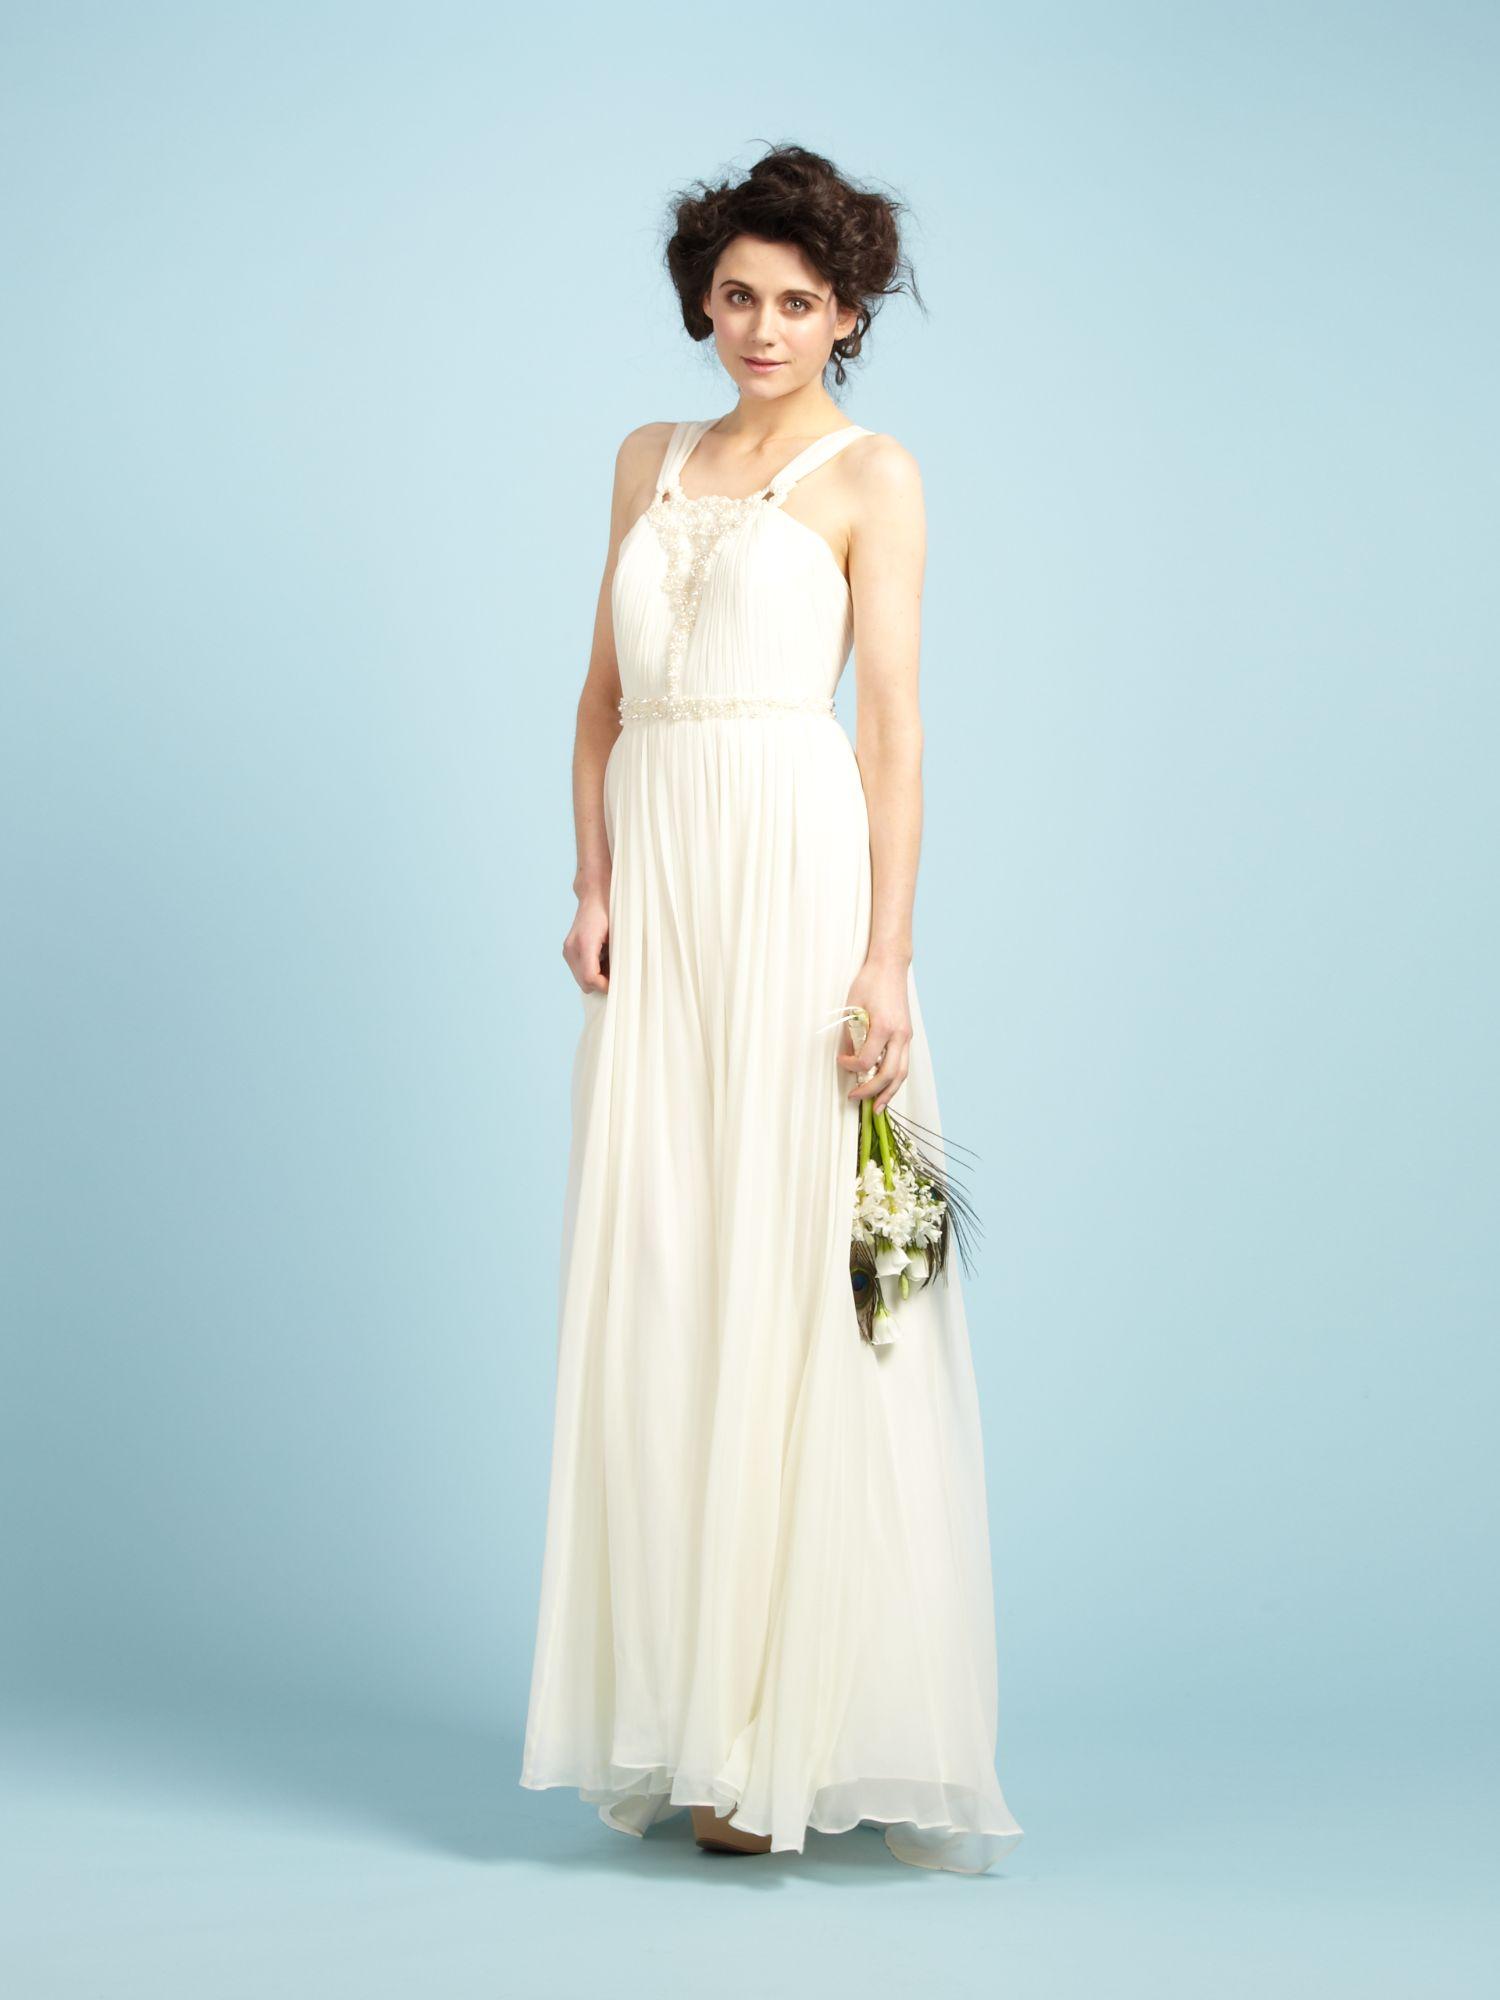 Dorable House Of Fraser Wedding Dress Adornment - All Wedding ...